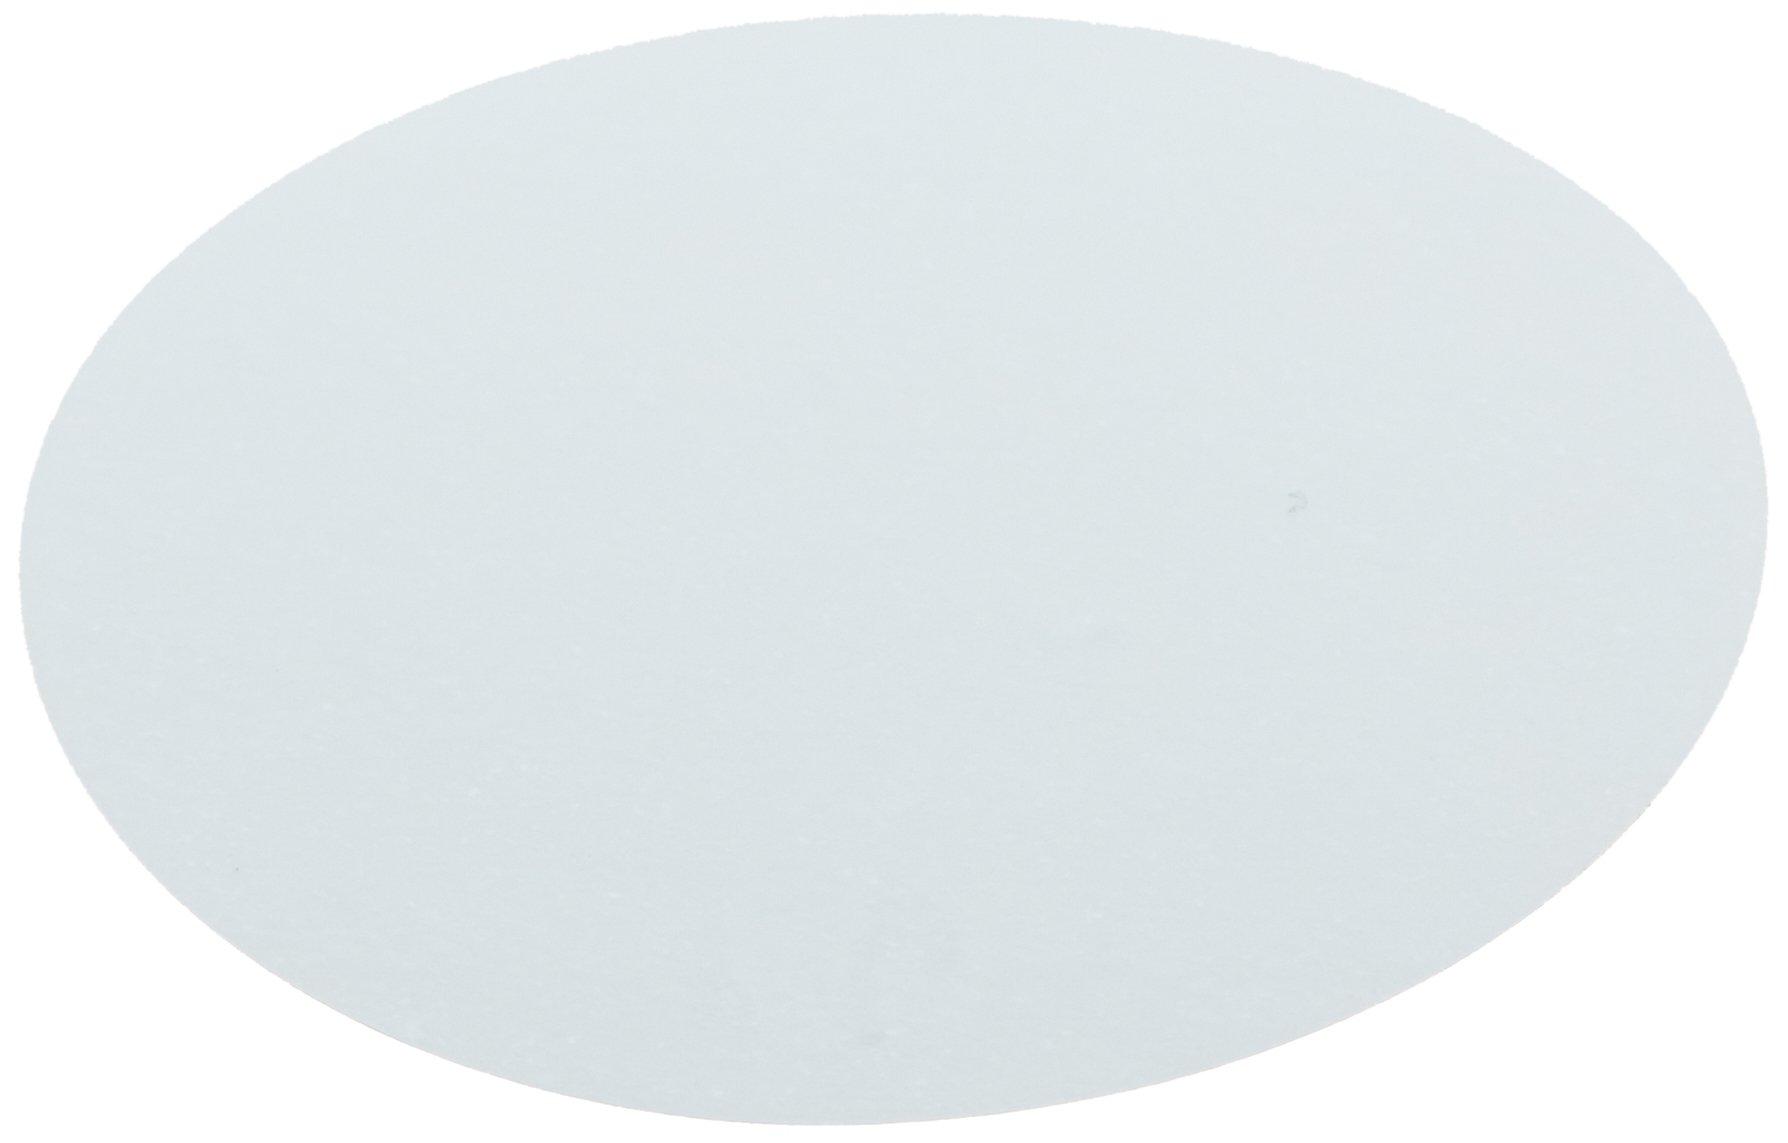 Whatman 10402014 Cellulose Nitrate Membrane, Non-Sterile, Circle, White, Plain Grid, 0.1µm Pore Size, 50mm Diameter (Pack of 100)